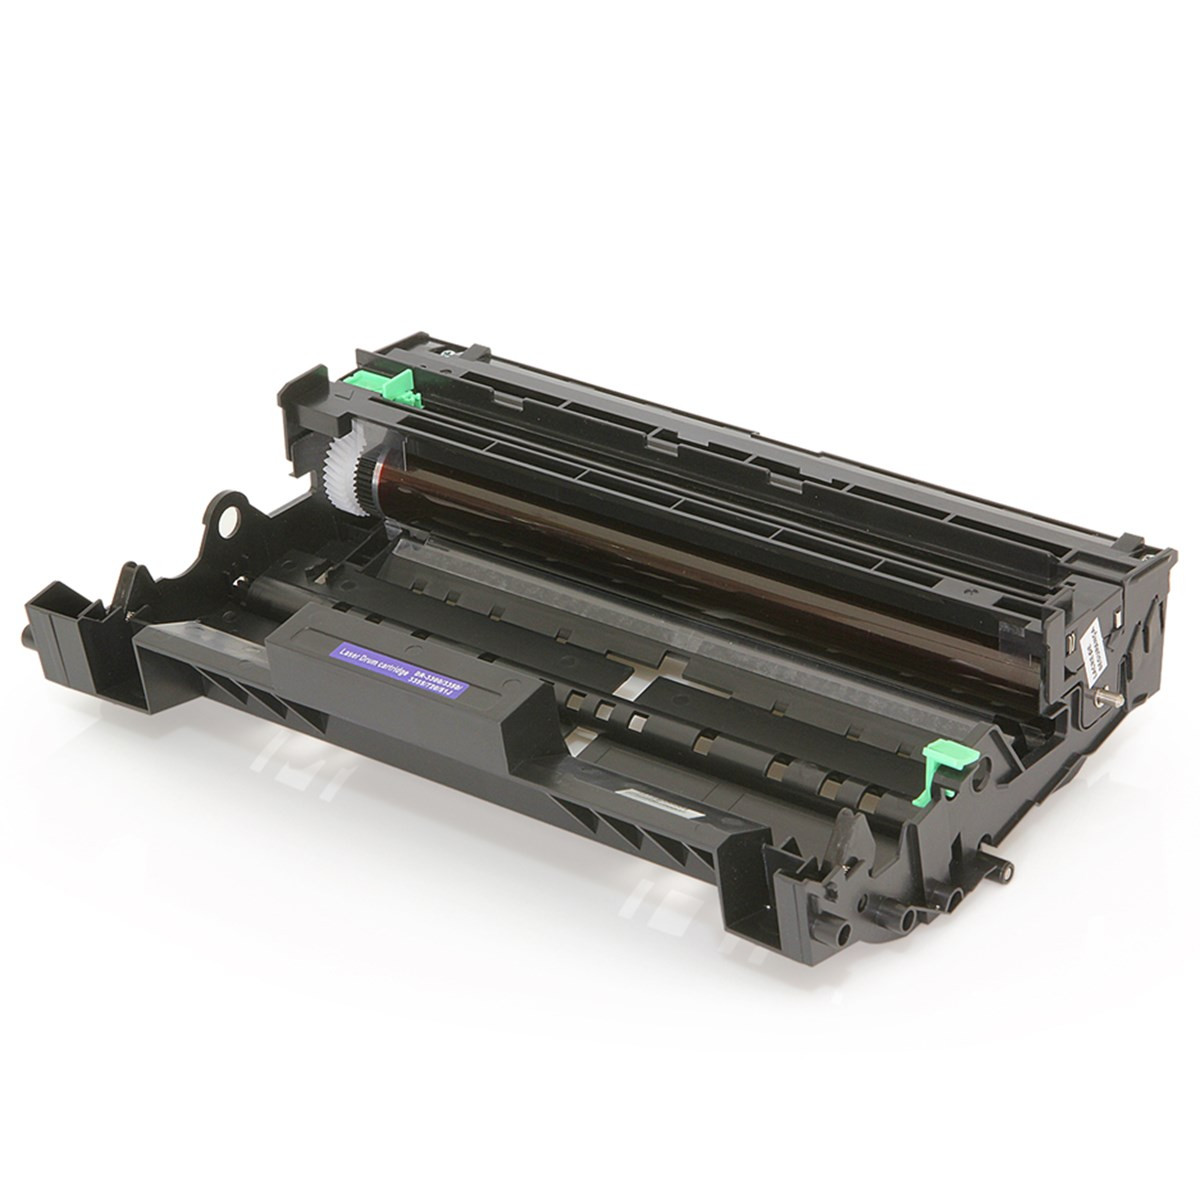 Cartucho de Cilindro Brother DR3302 | HL5452 DCP8112 MFC8512 HL5472 DCP8152 MFC8712 | Premium 30k